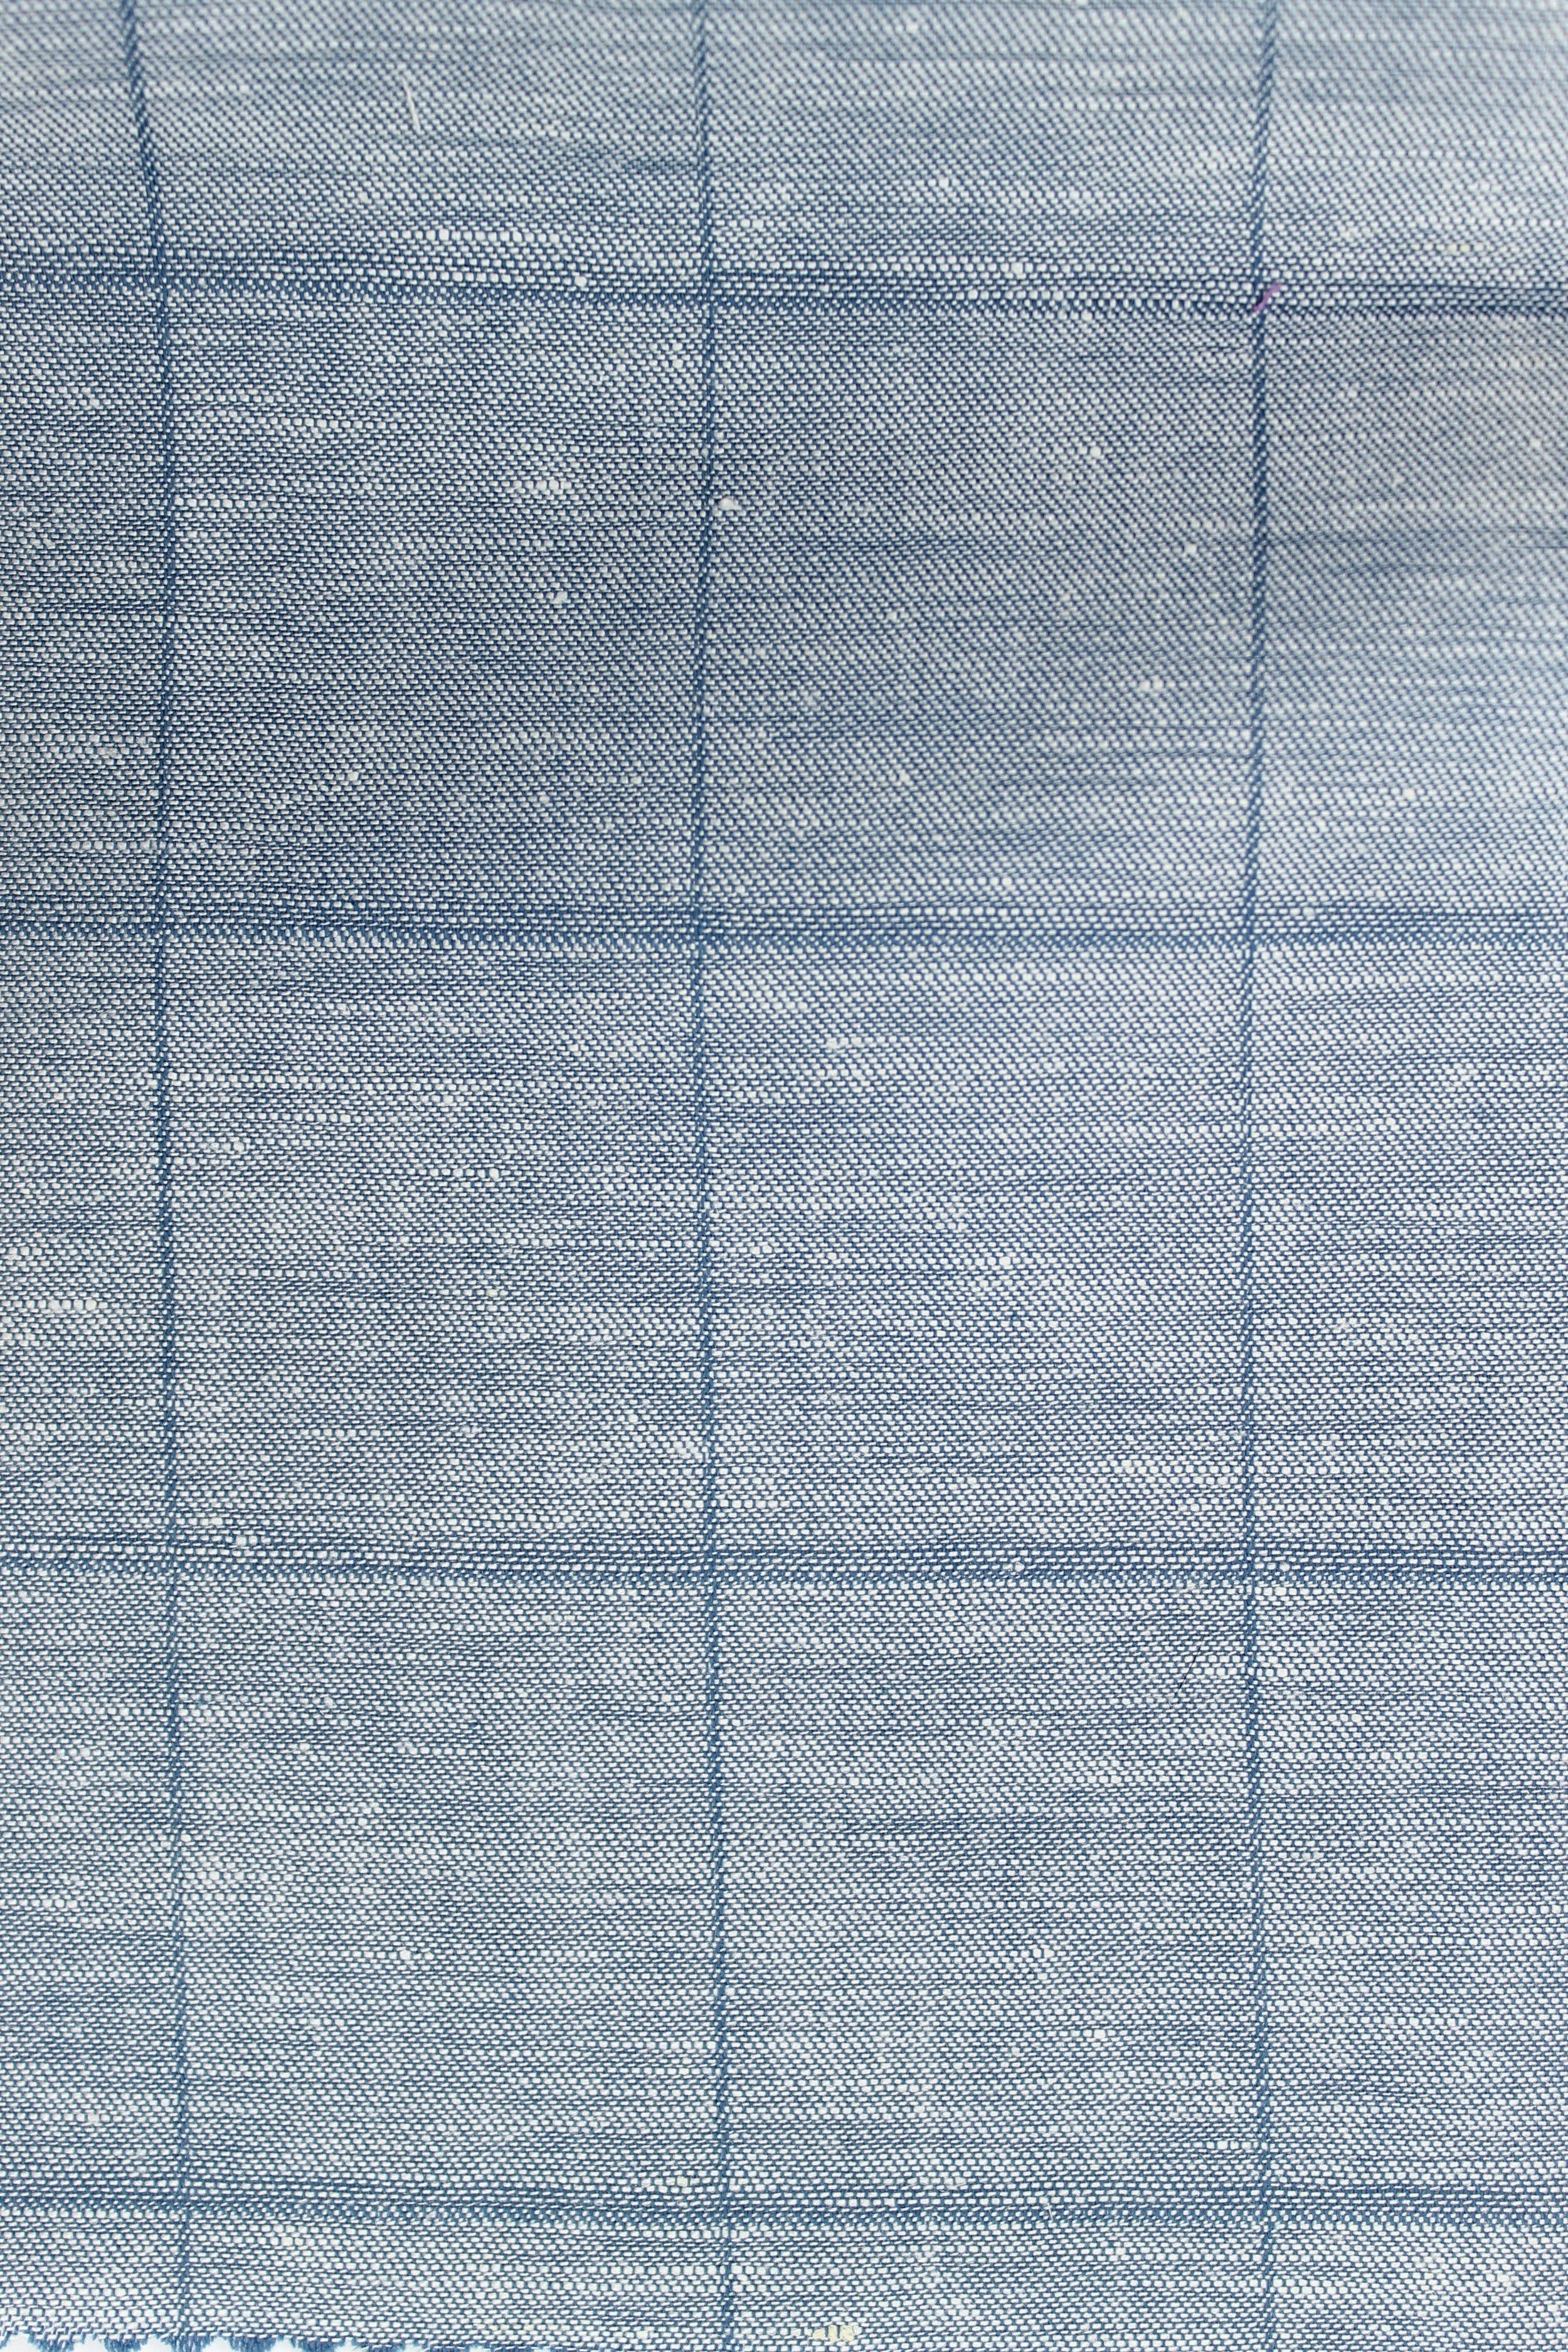 L115 Blue Windowpane Linen.JPG